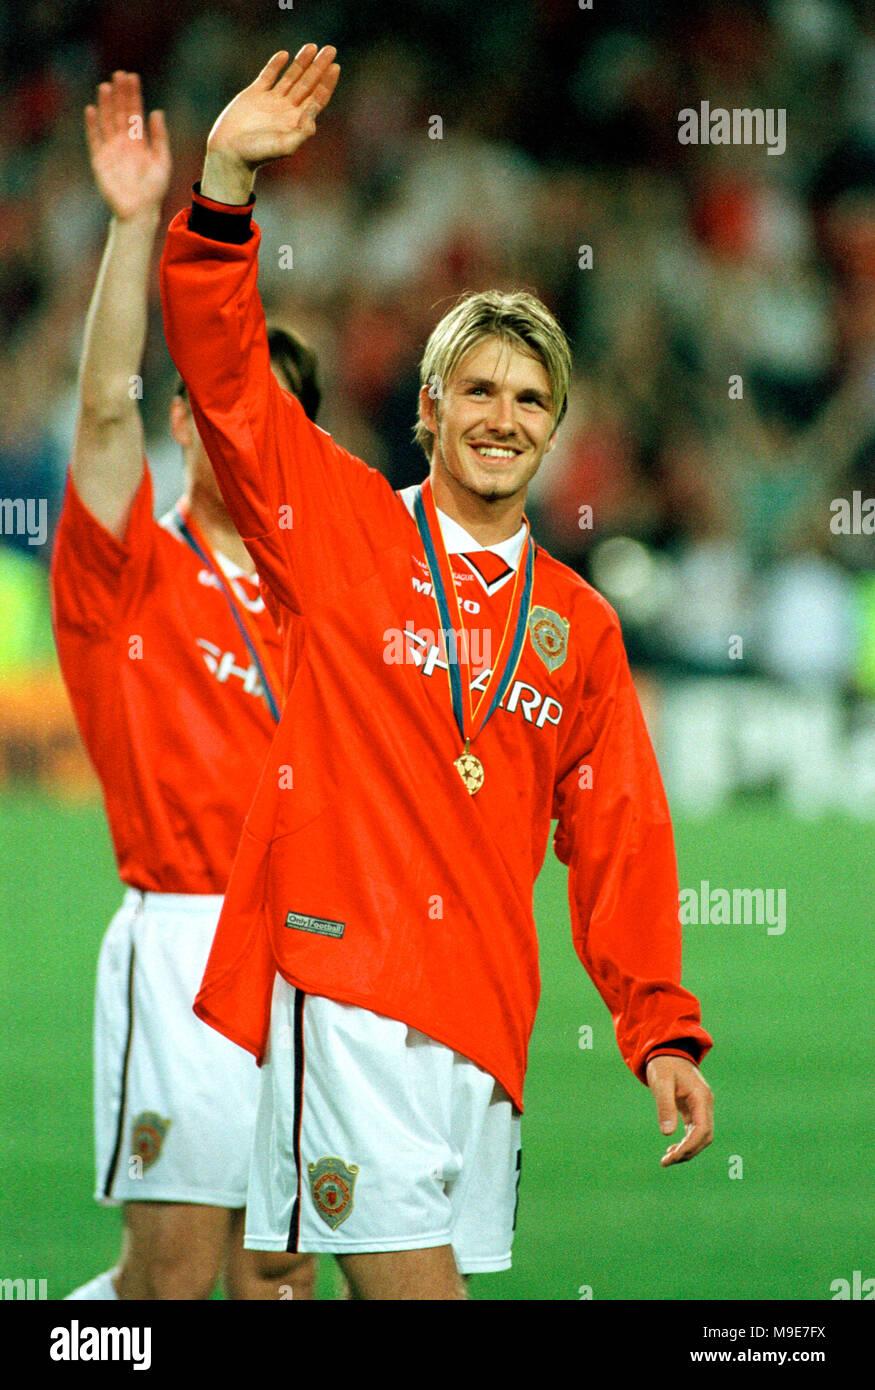 Stadium Camp Nou Barcelona Spain 2651999 UEFA Champions League Final Manchester United Vs FC Bayern Munich 21 David Beckham ManU With Medal